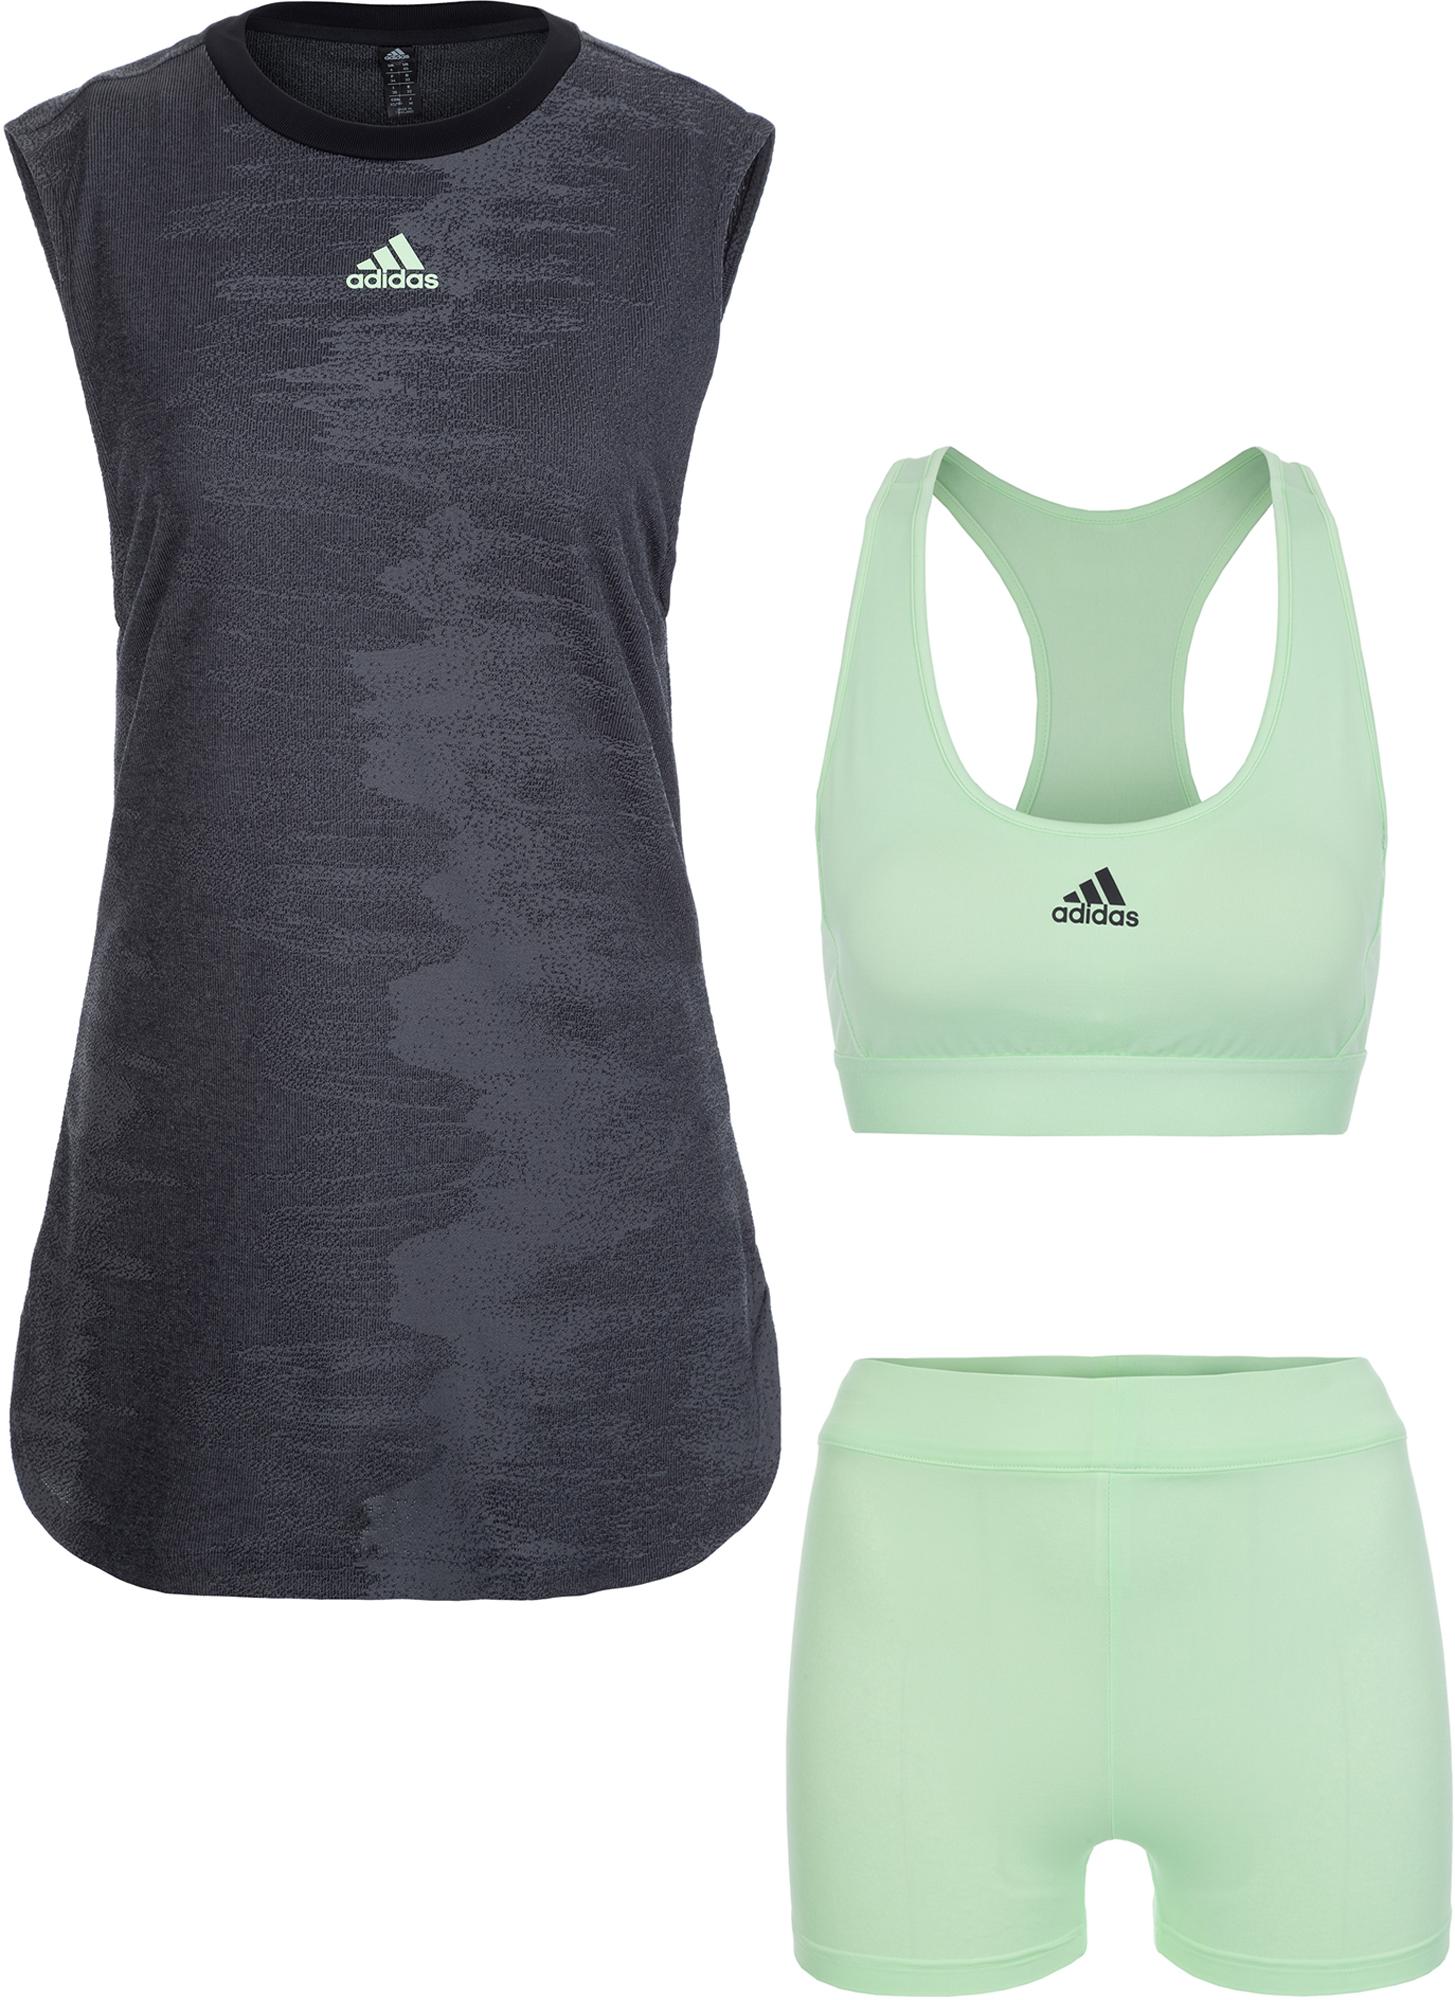 цены Adidas Платье женское Adidas New York, размер 46-48